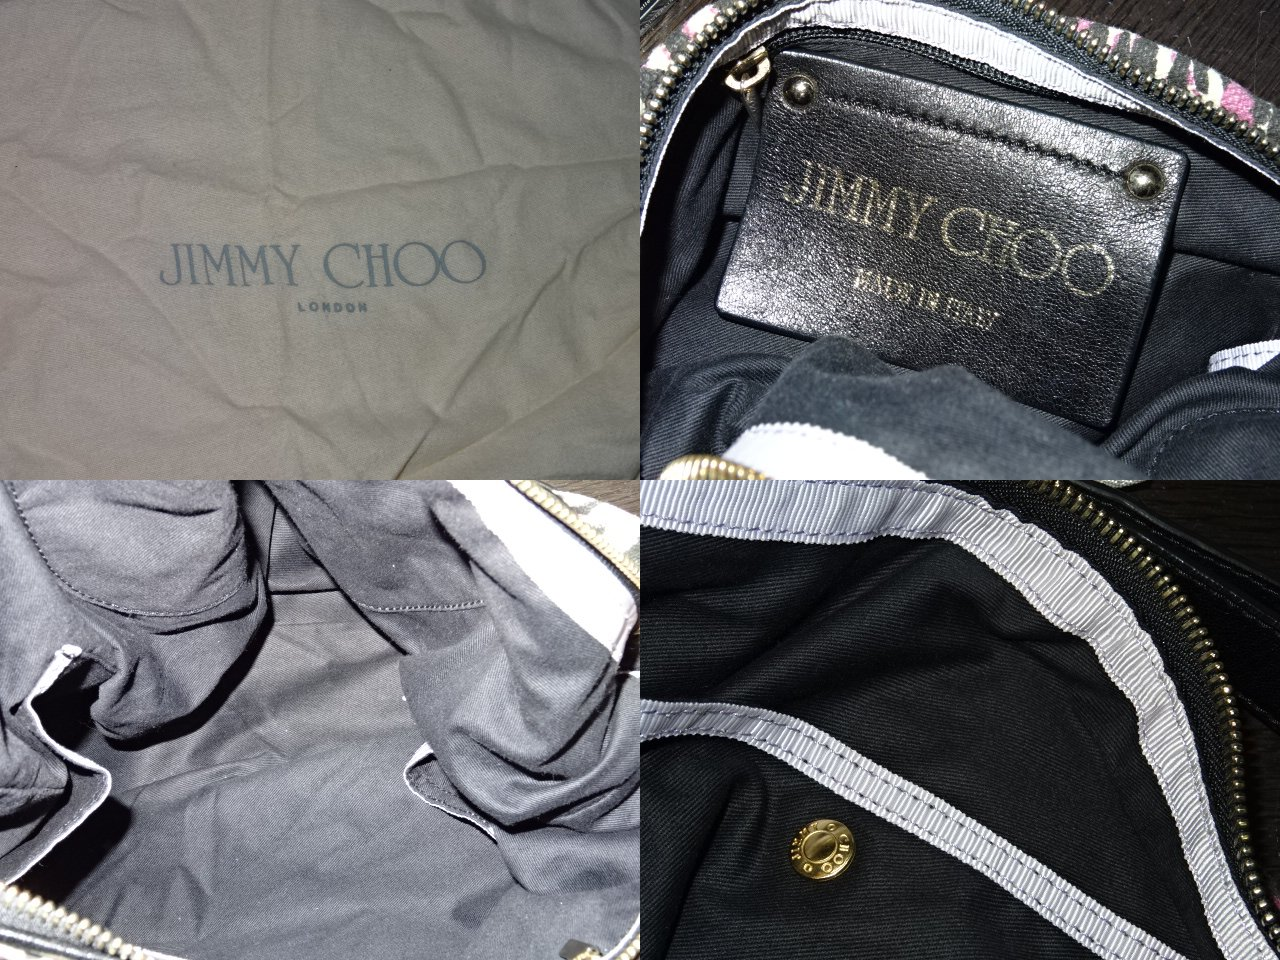 JIMMY CHOO ジミーチュウ  レオパード柄 キャンバスワンショルダーハンドバッグ ジミーチュウ